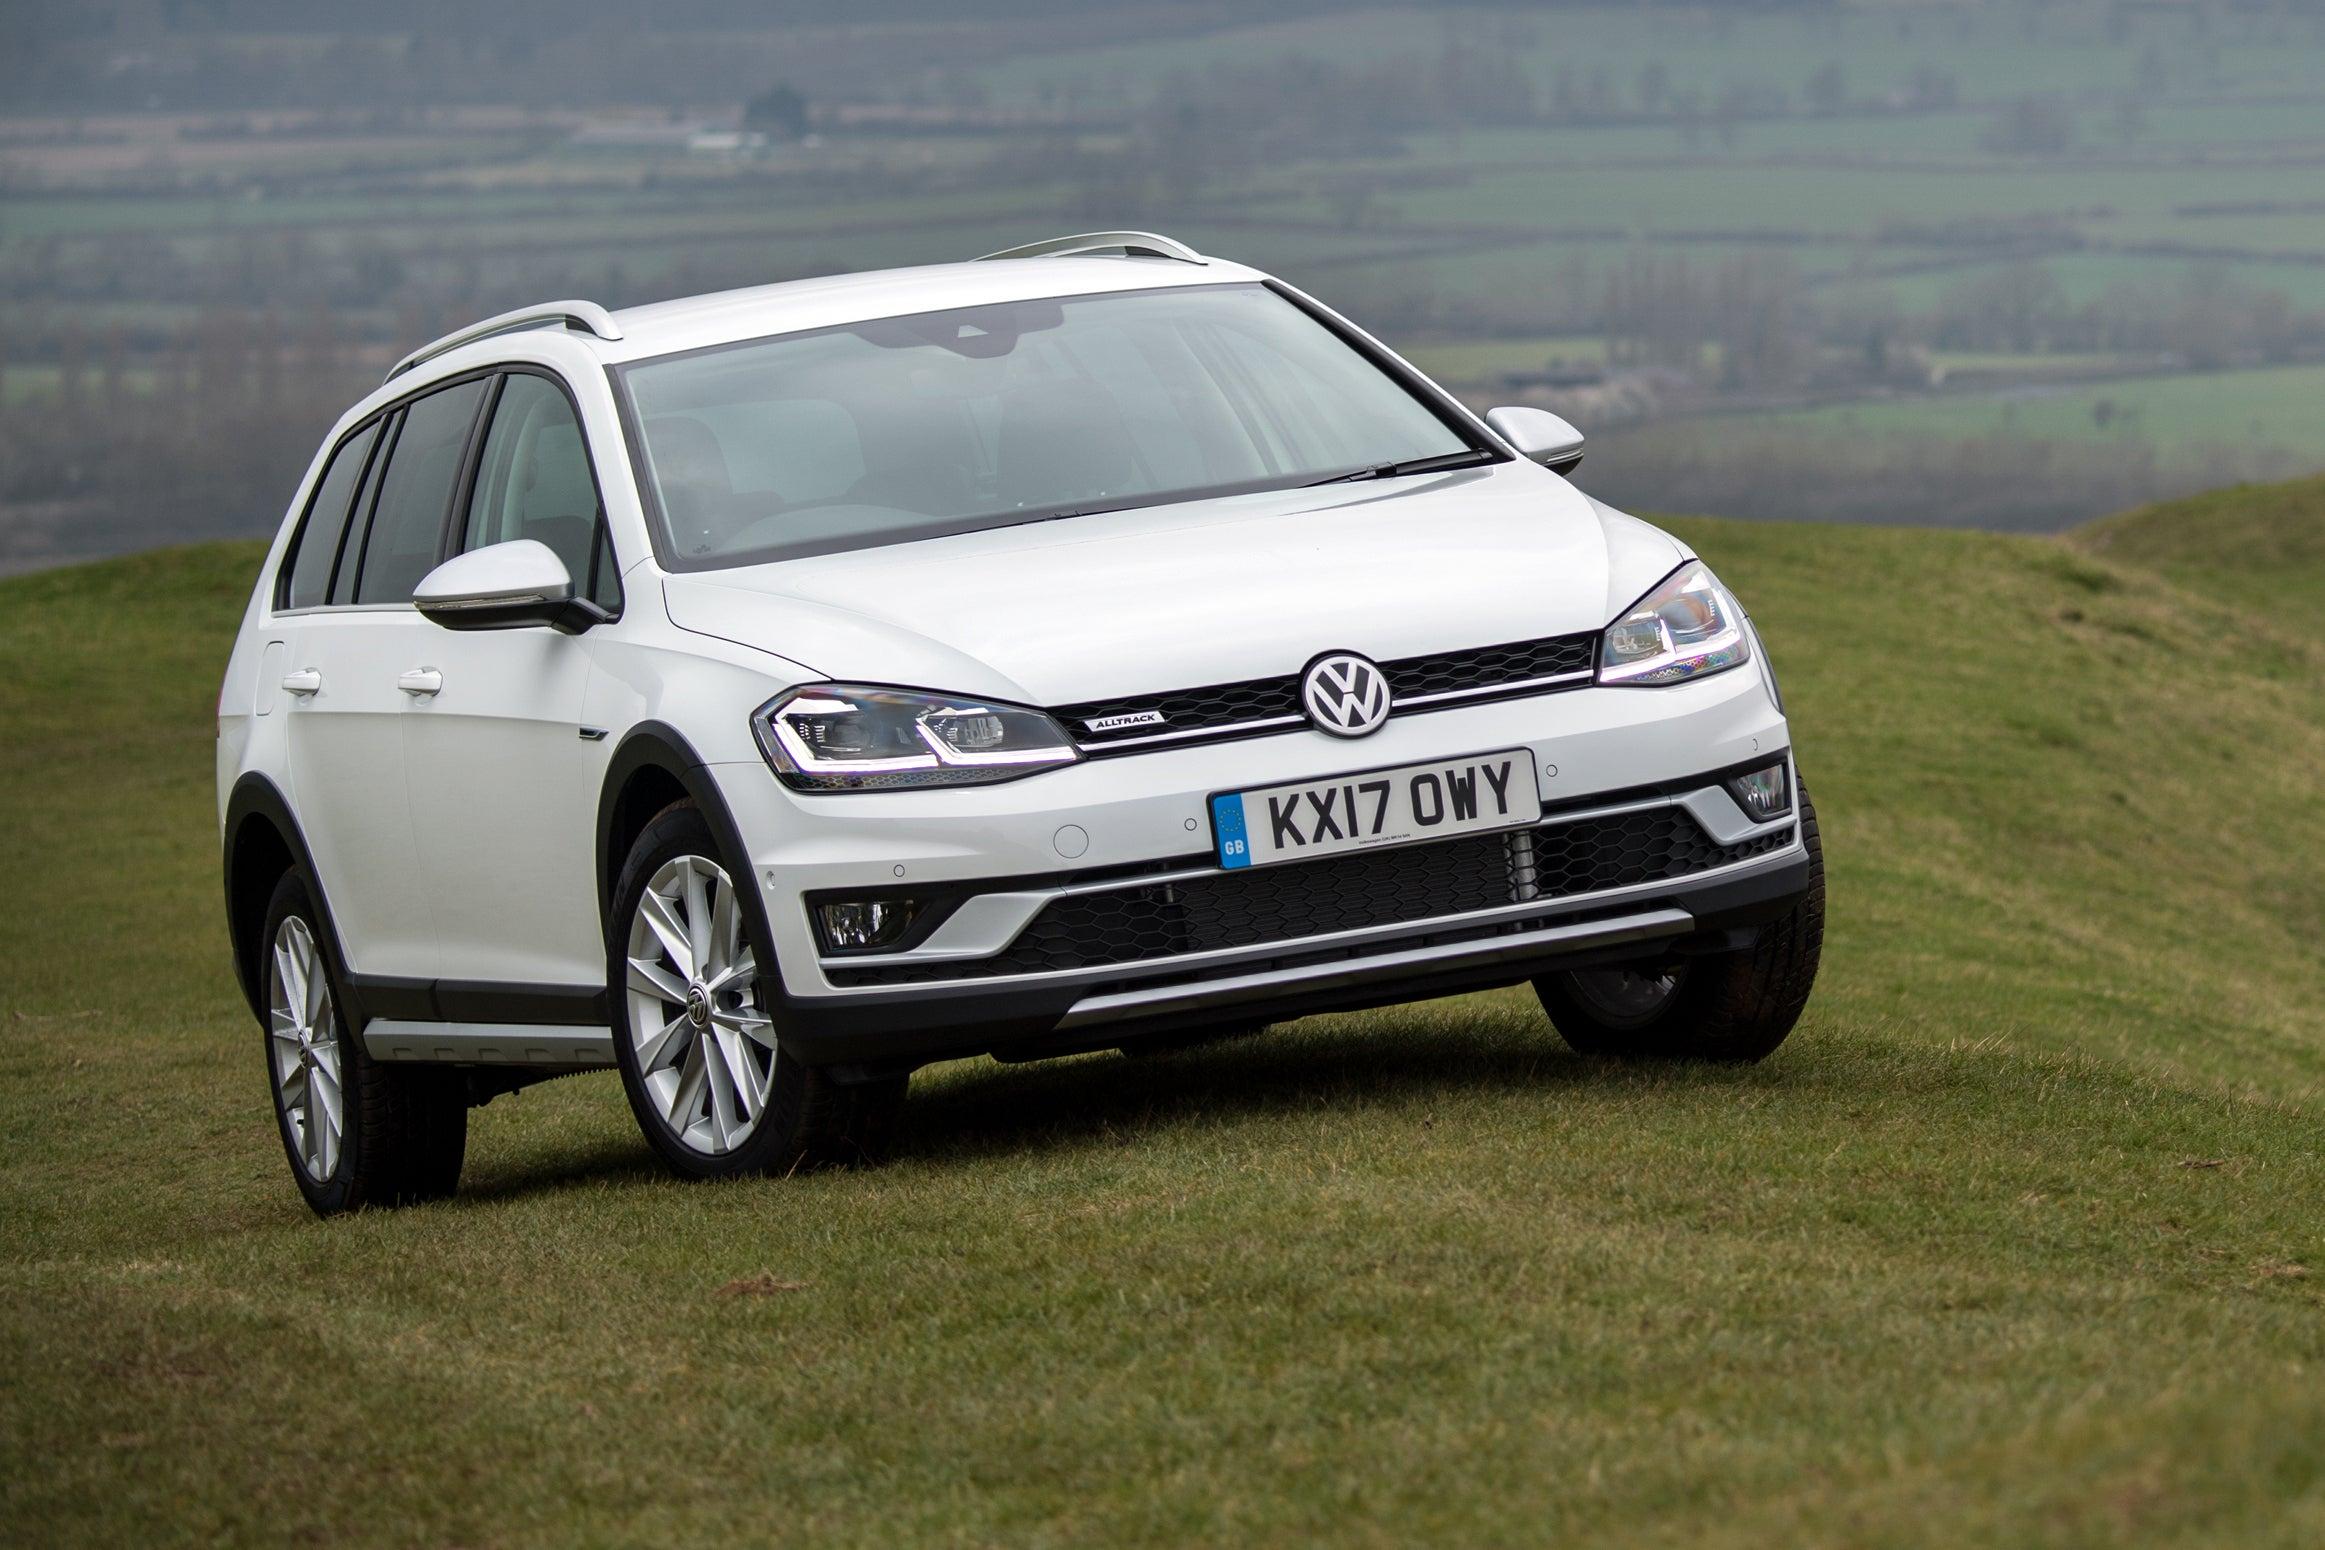 Volkswagen Golf Alltrack Front Side View